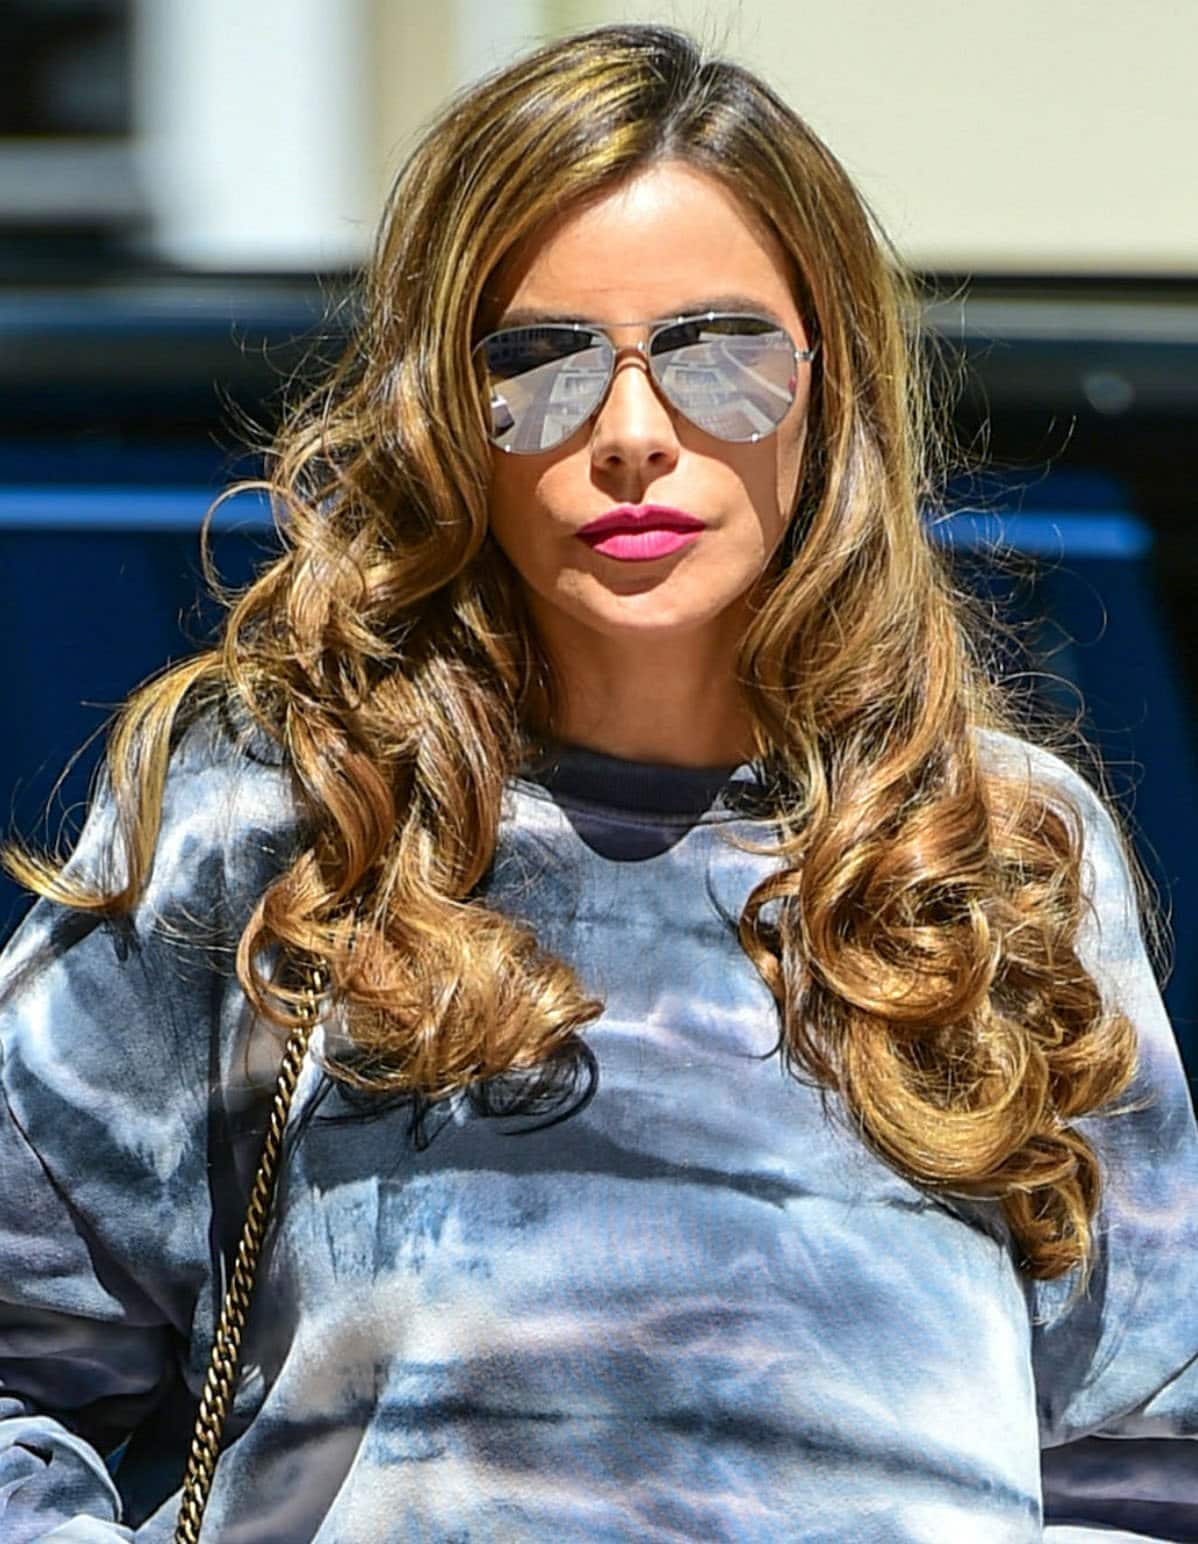 Sofia Vergara wears her signature curls and pink lipstick